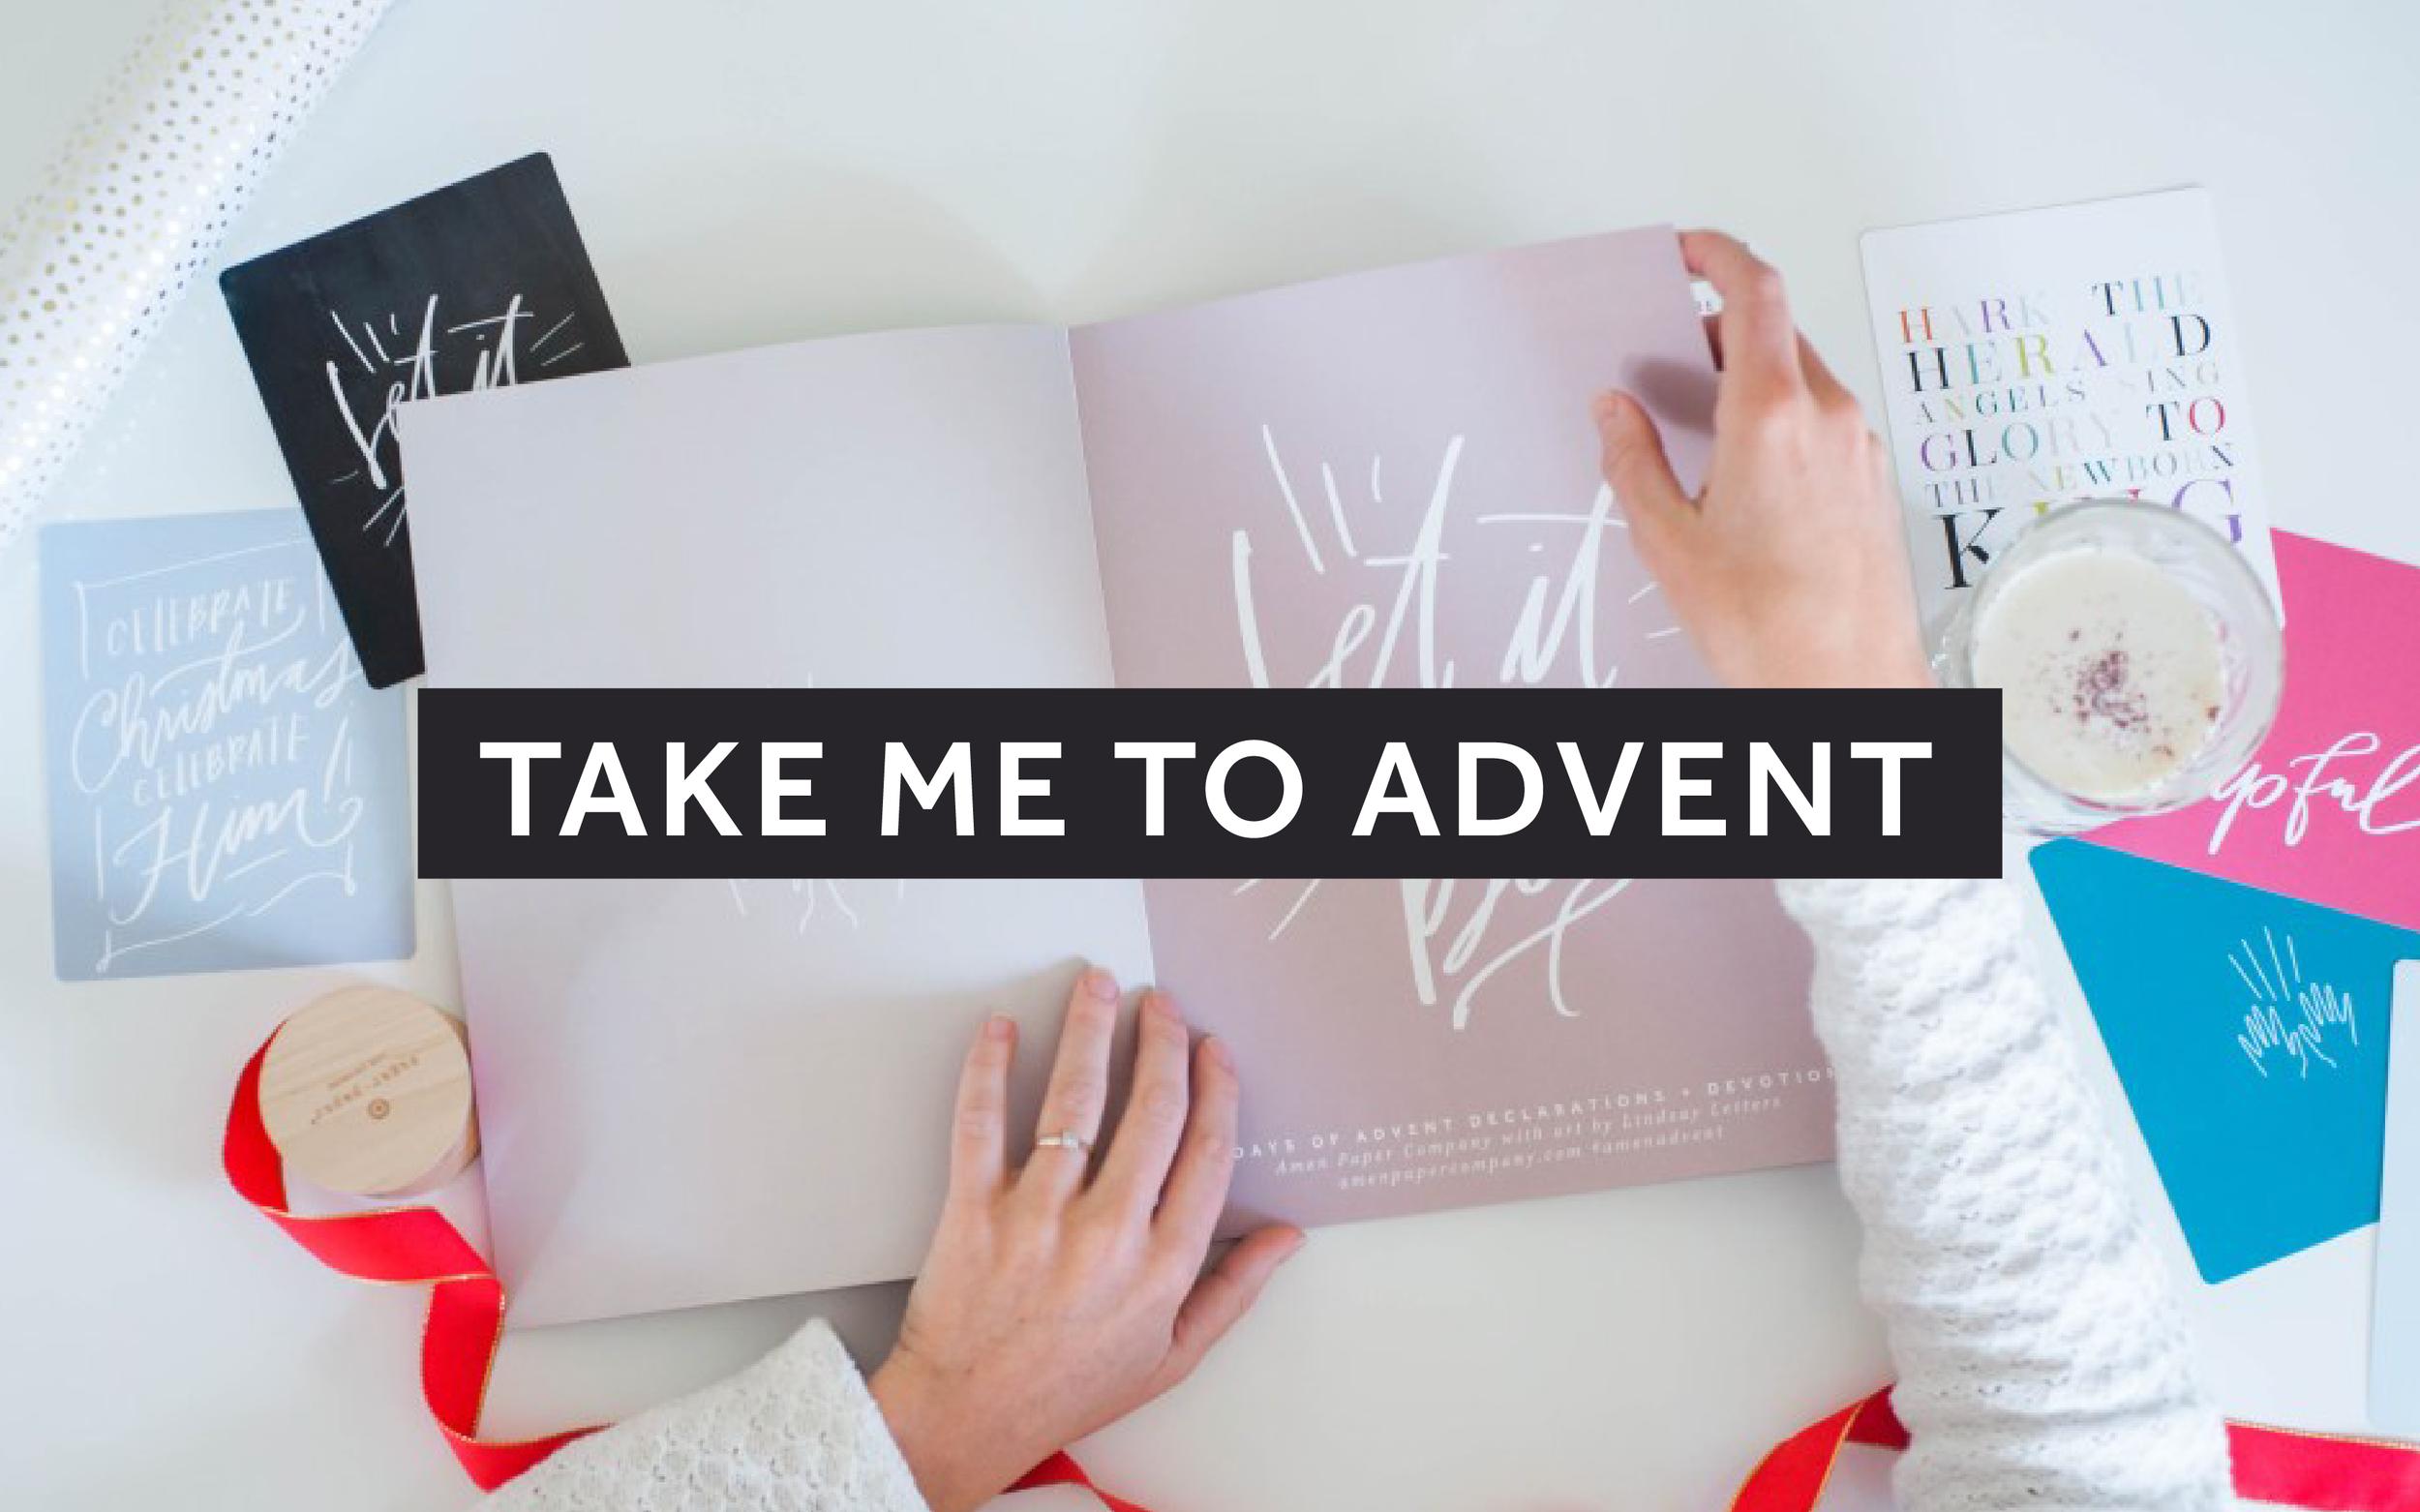 Take me to Advent